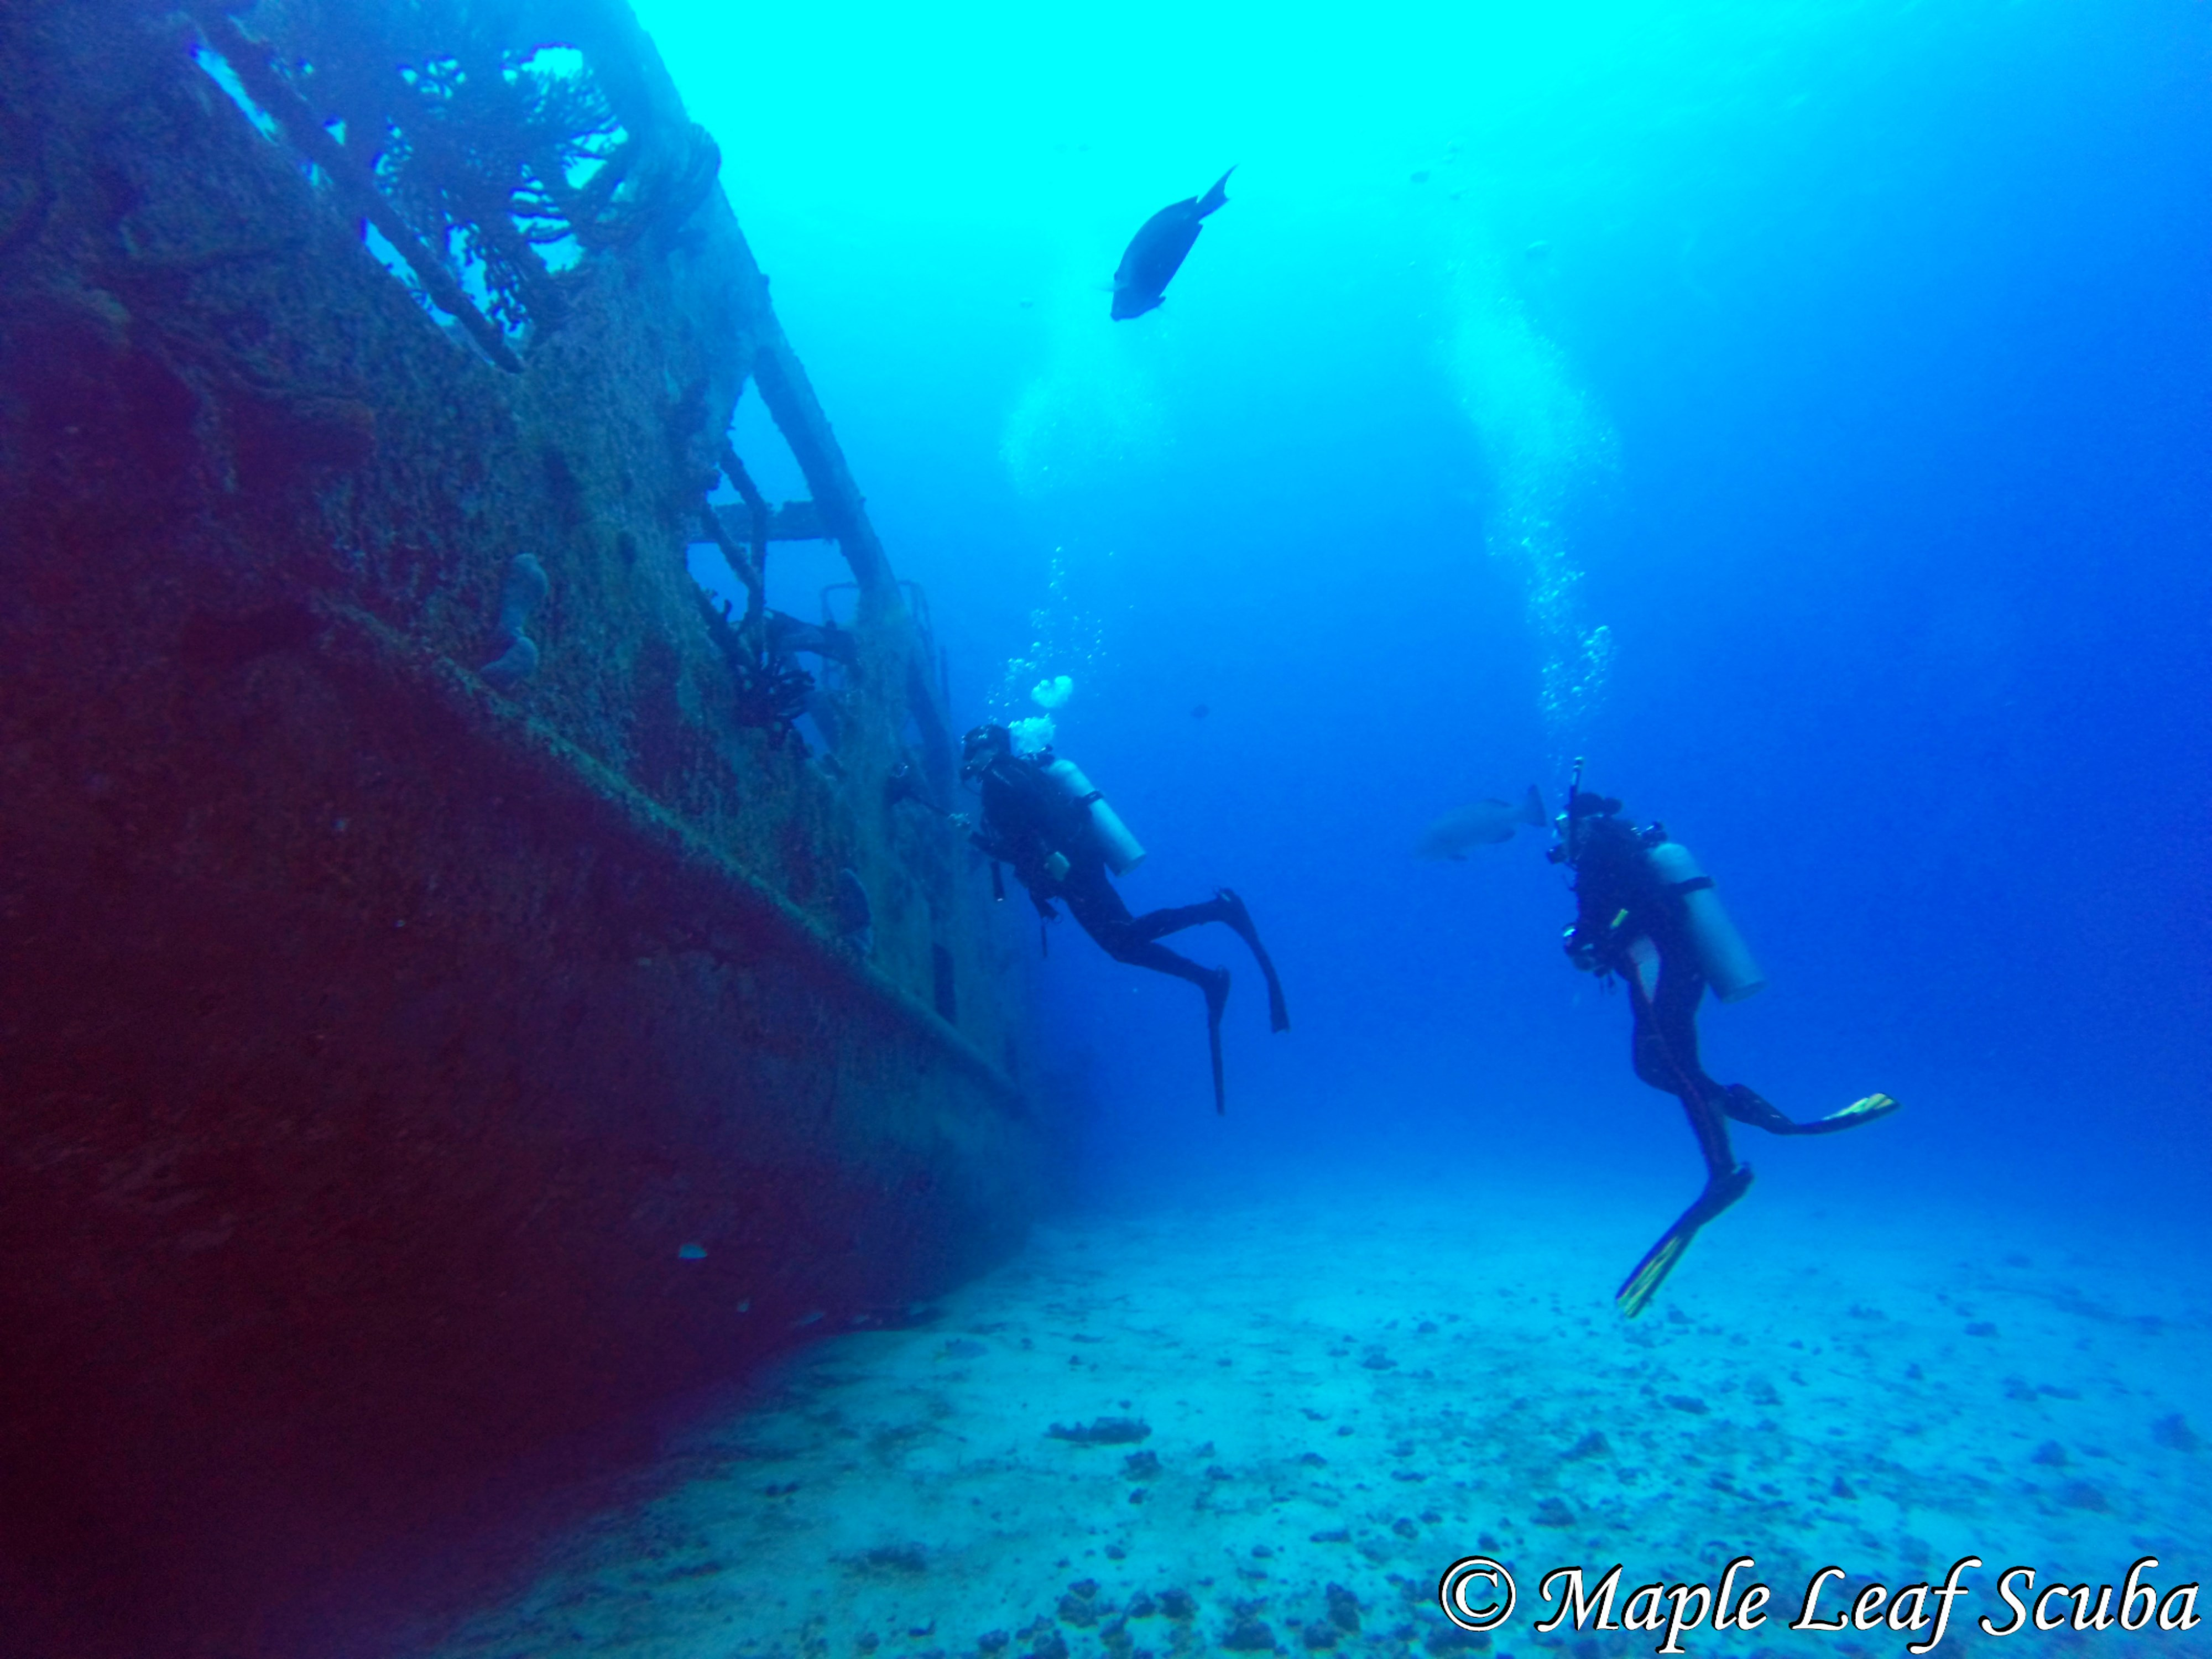 Diving the C53 Felipe Xicotencatl Ship Wreck in Cozumel